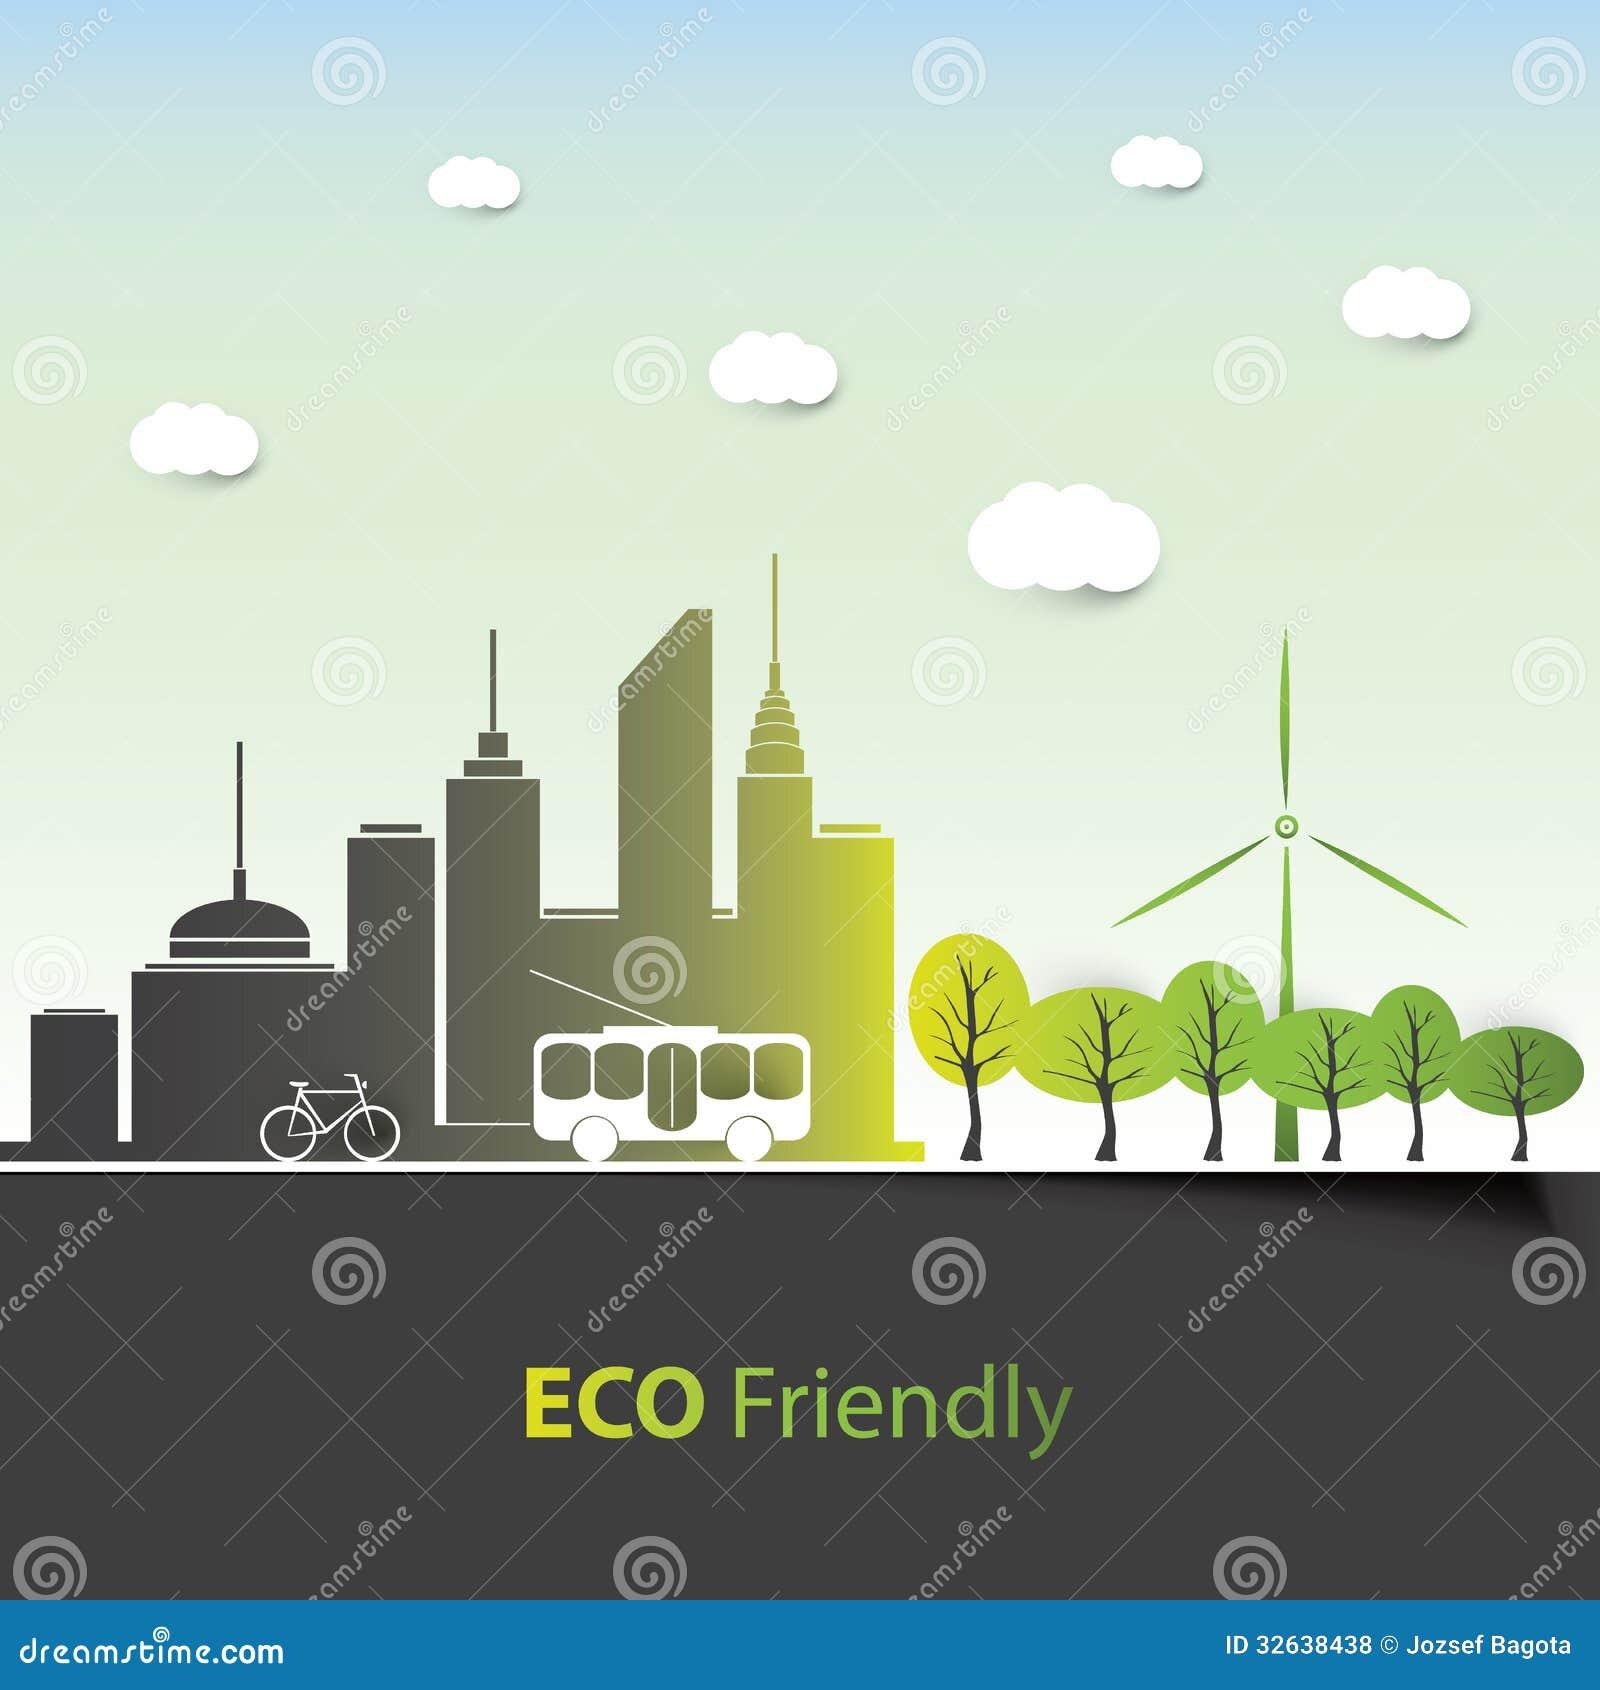 Environmental Concept Earthfriendly Landscapes: Background Design Stock Vector